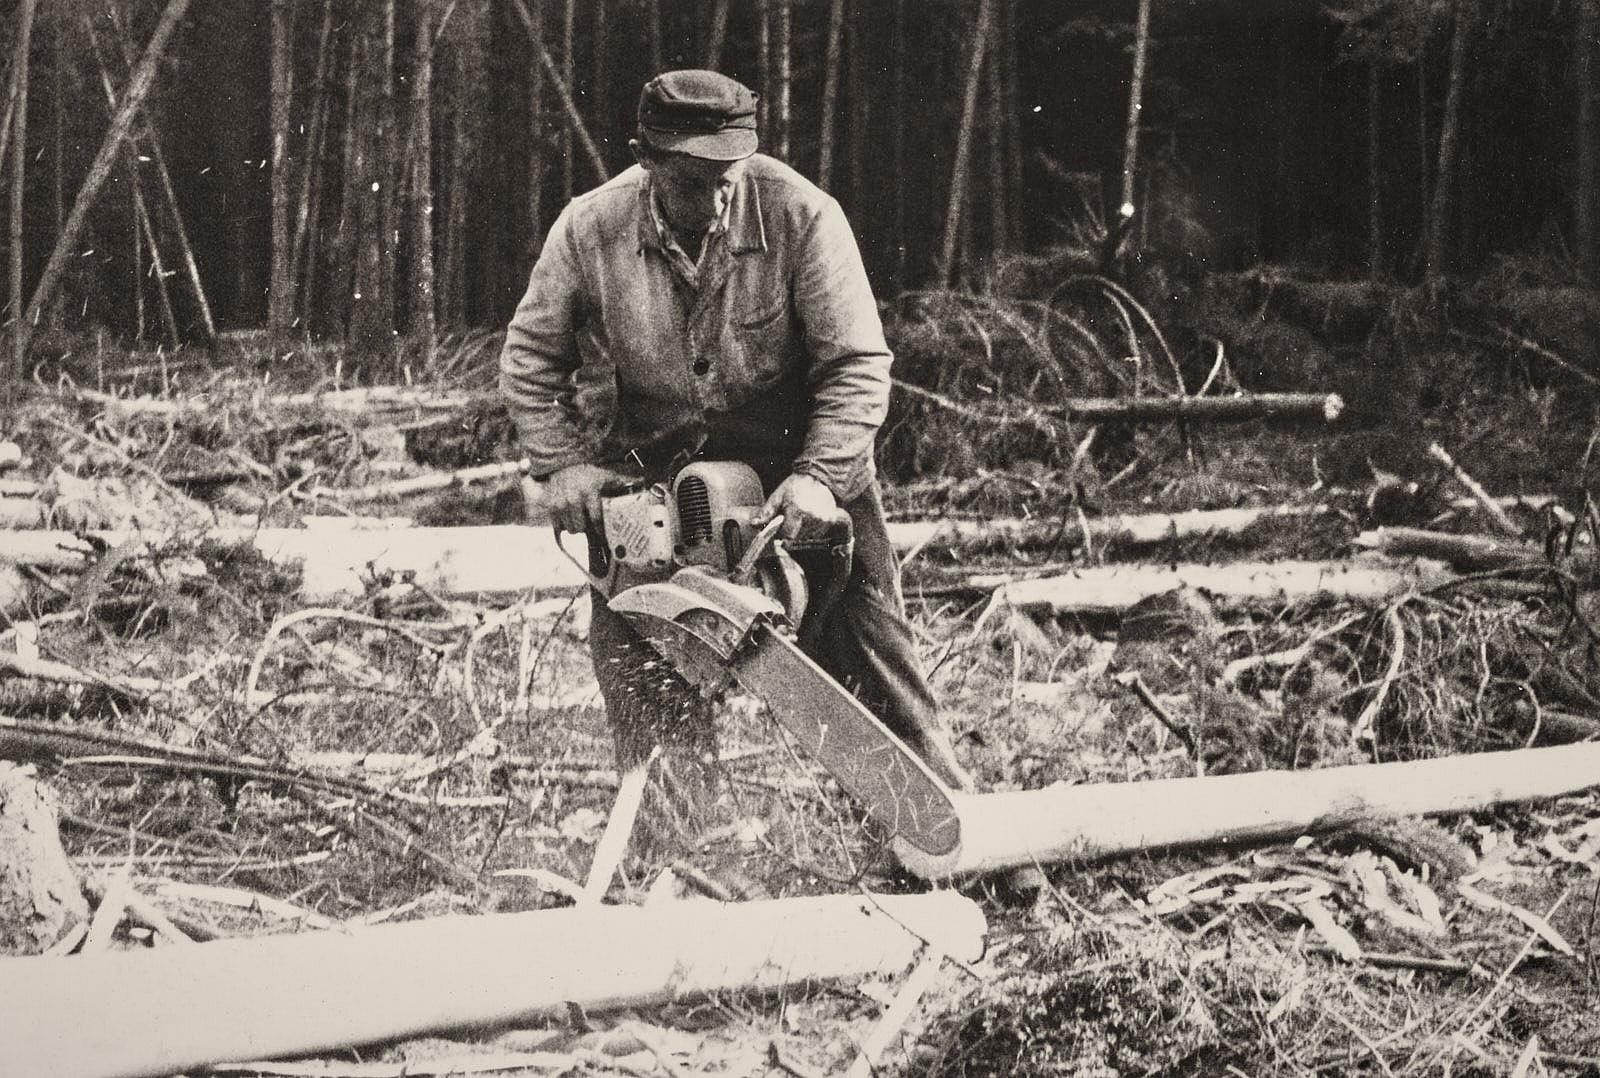 Waldarbeiter mit Motorsäge - Mitte Ende 20. Jh.